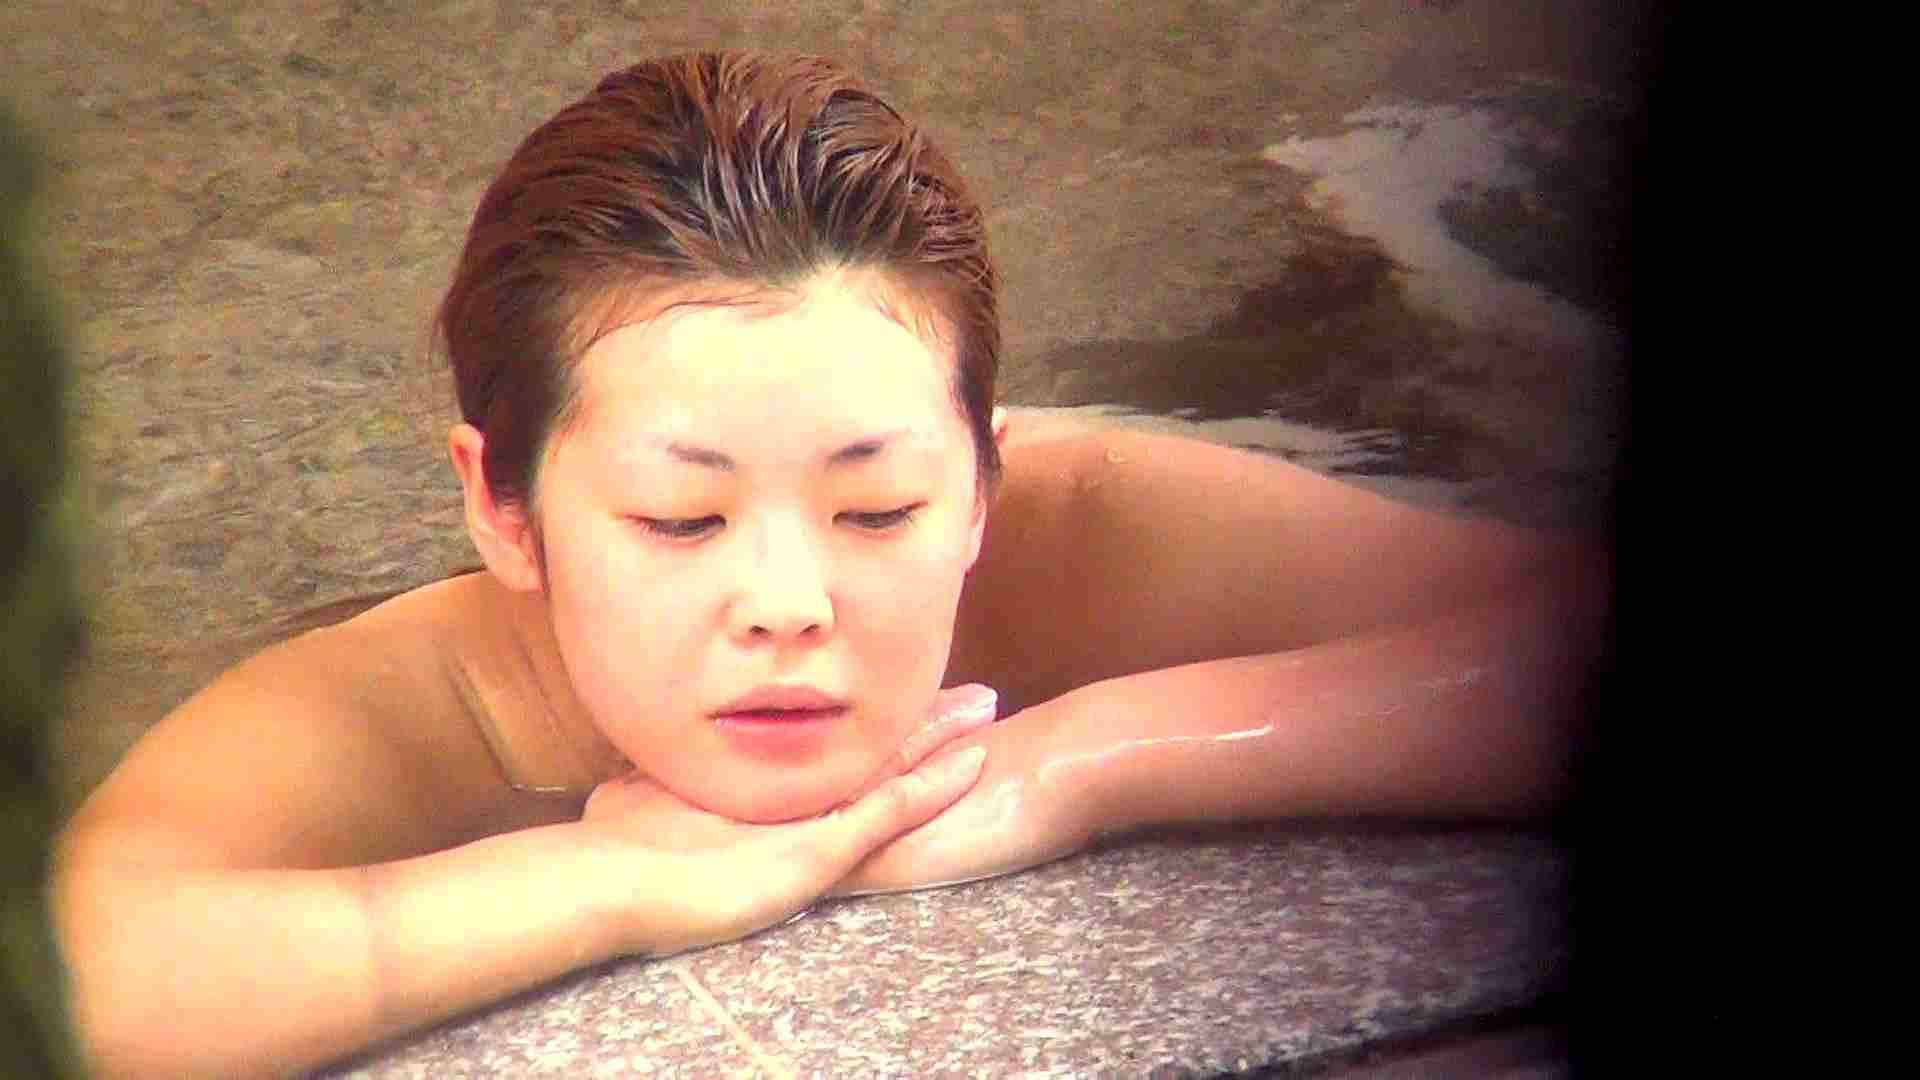 Aquaな露天風呂Vol.288 盗撮シリーズ | 露天風呂編  79PIX 47